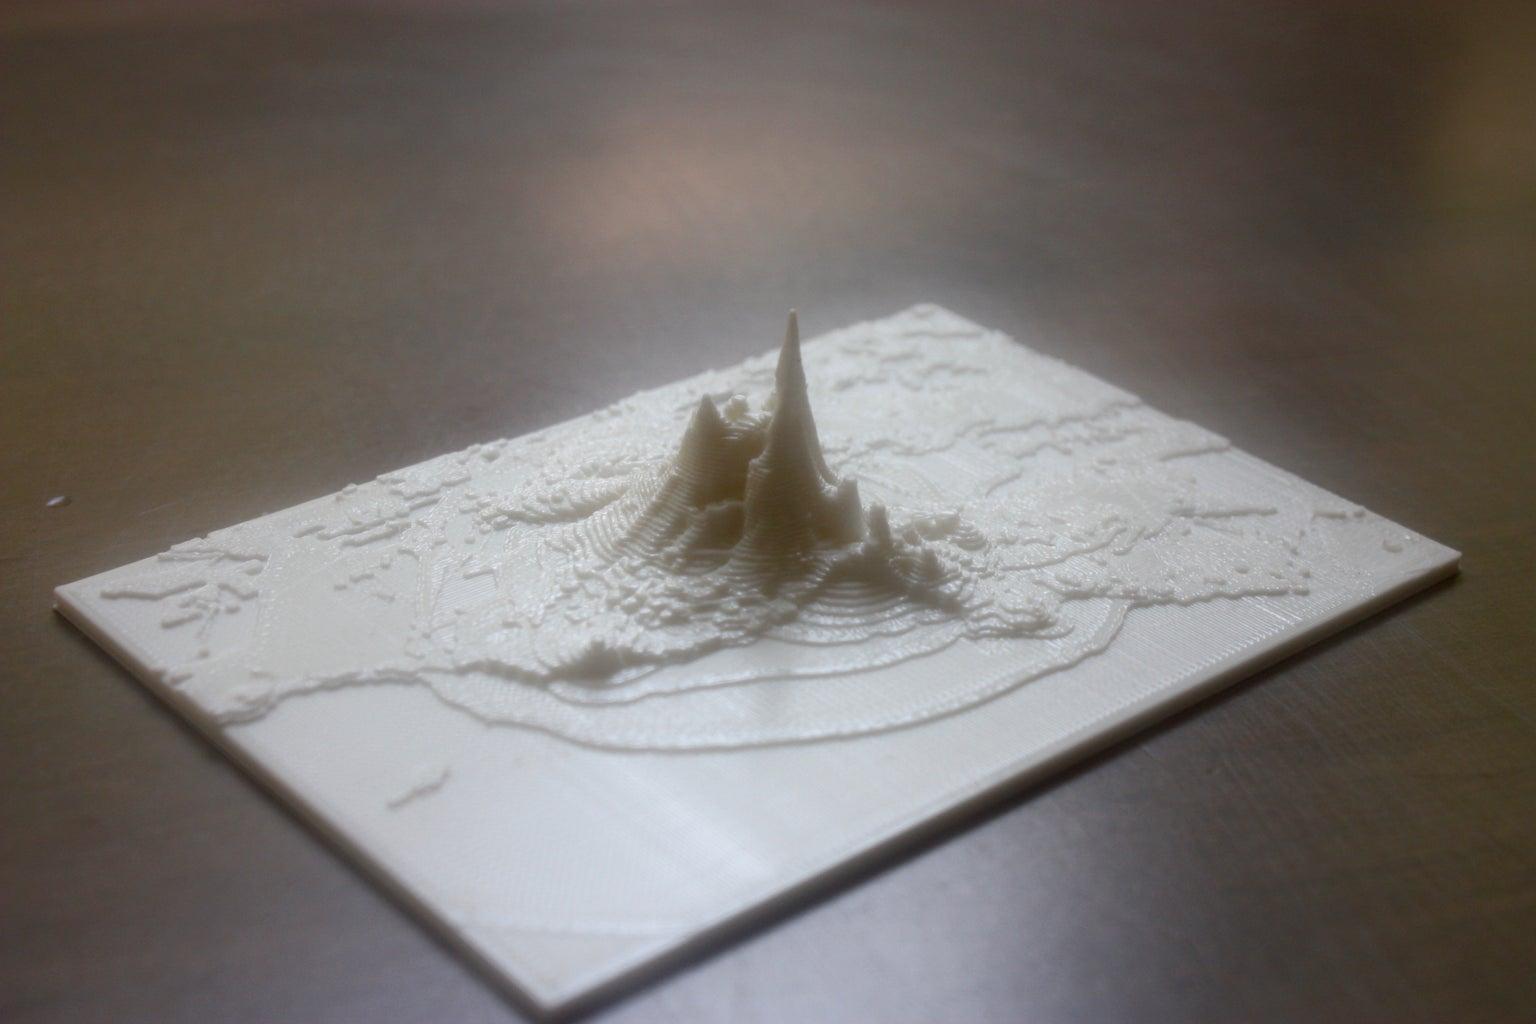 Print the Earthquake